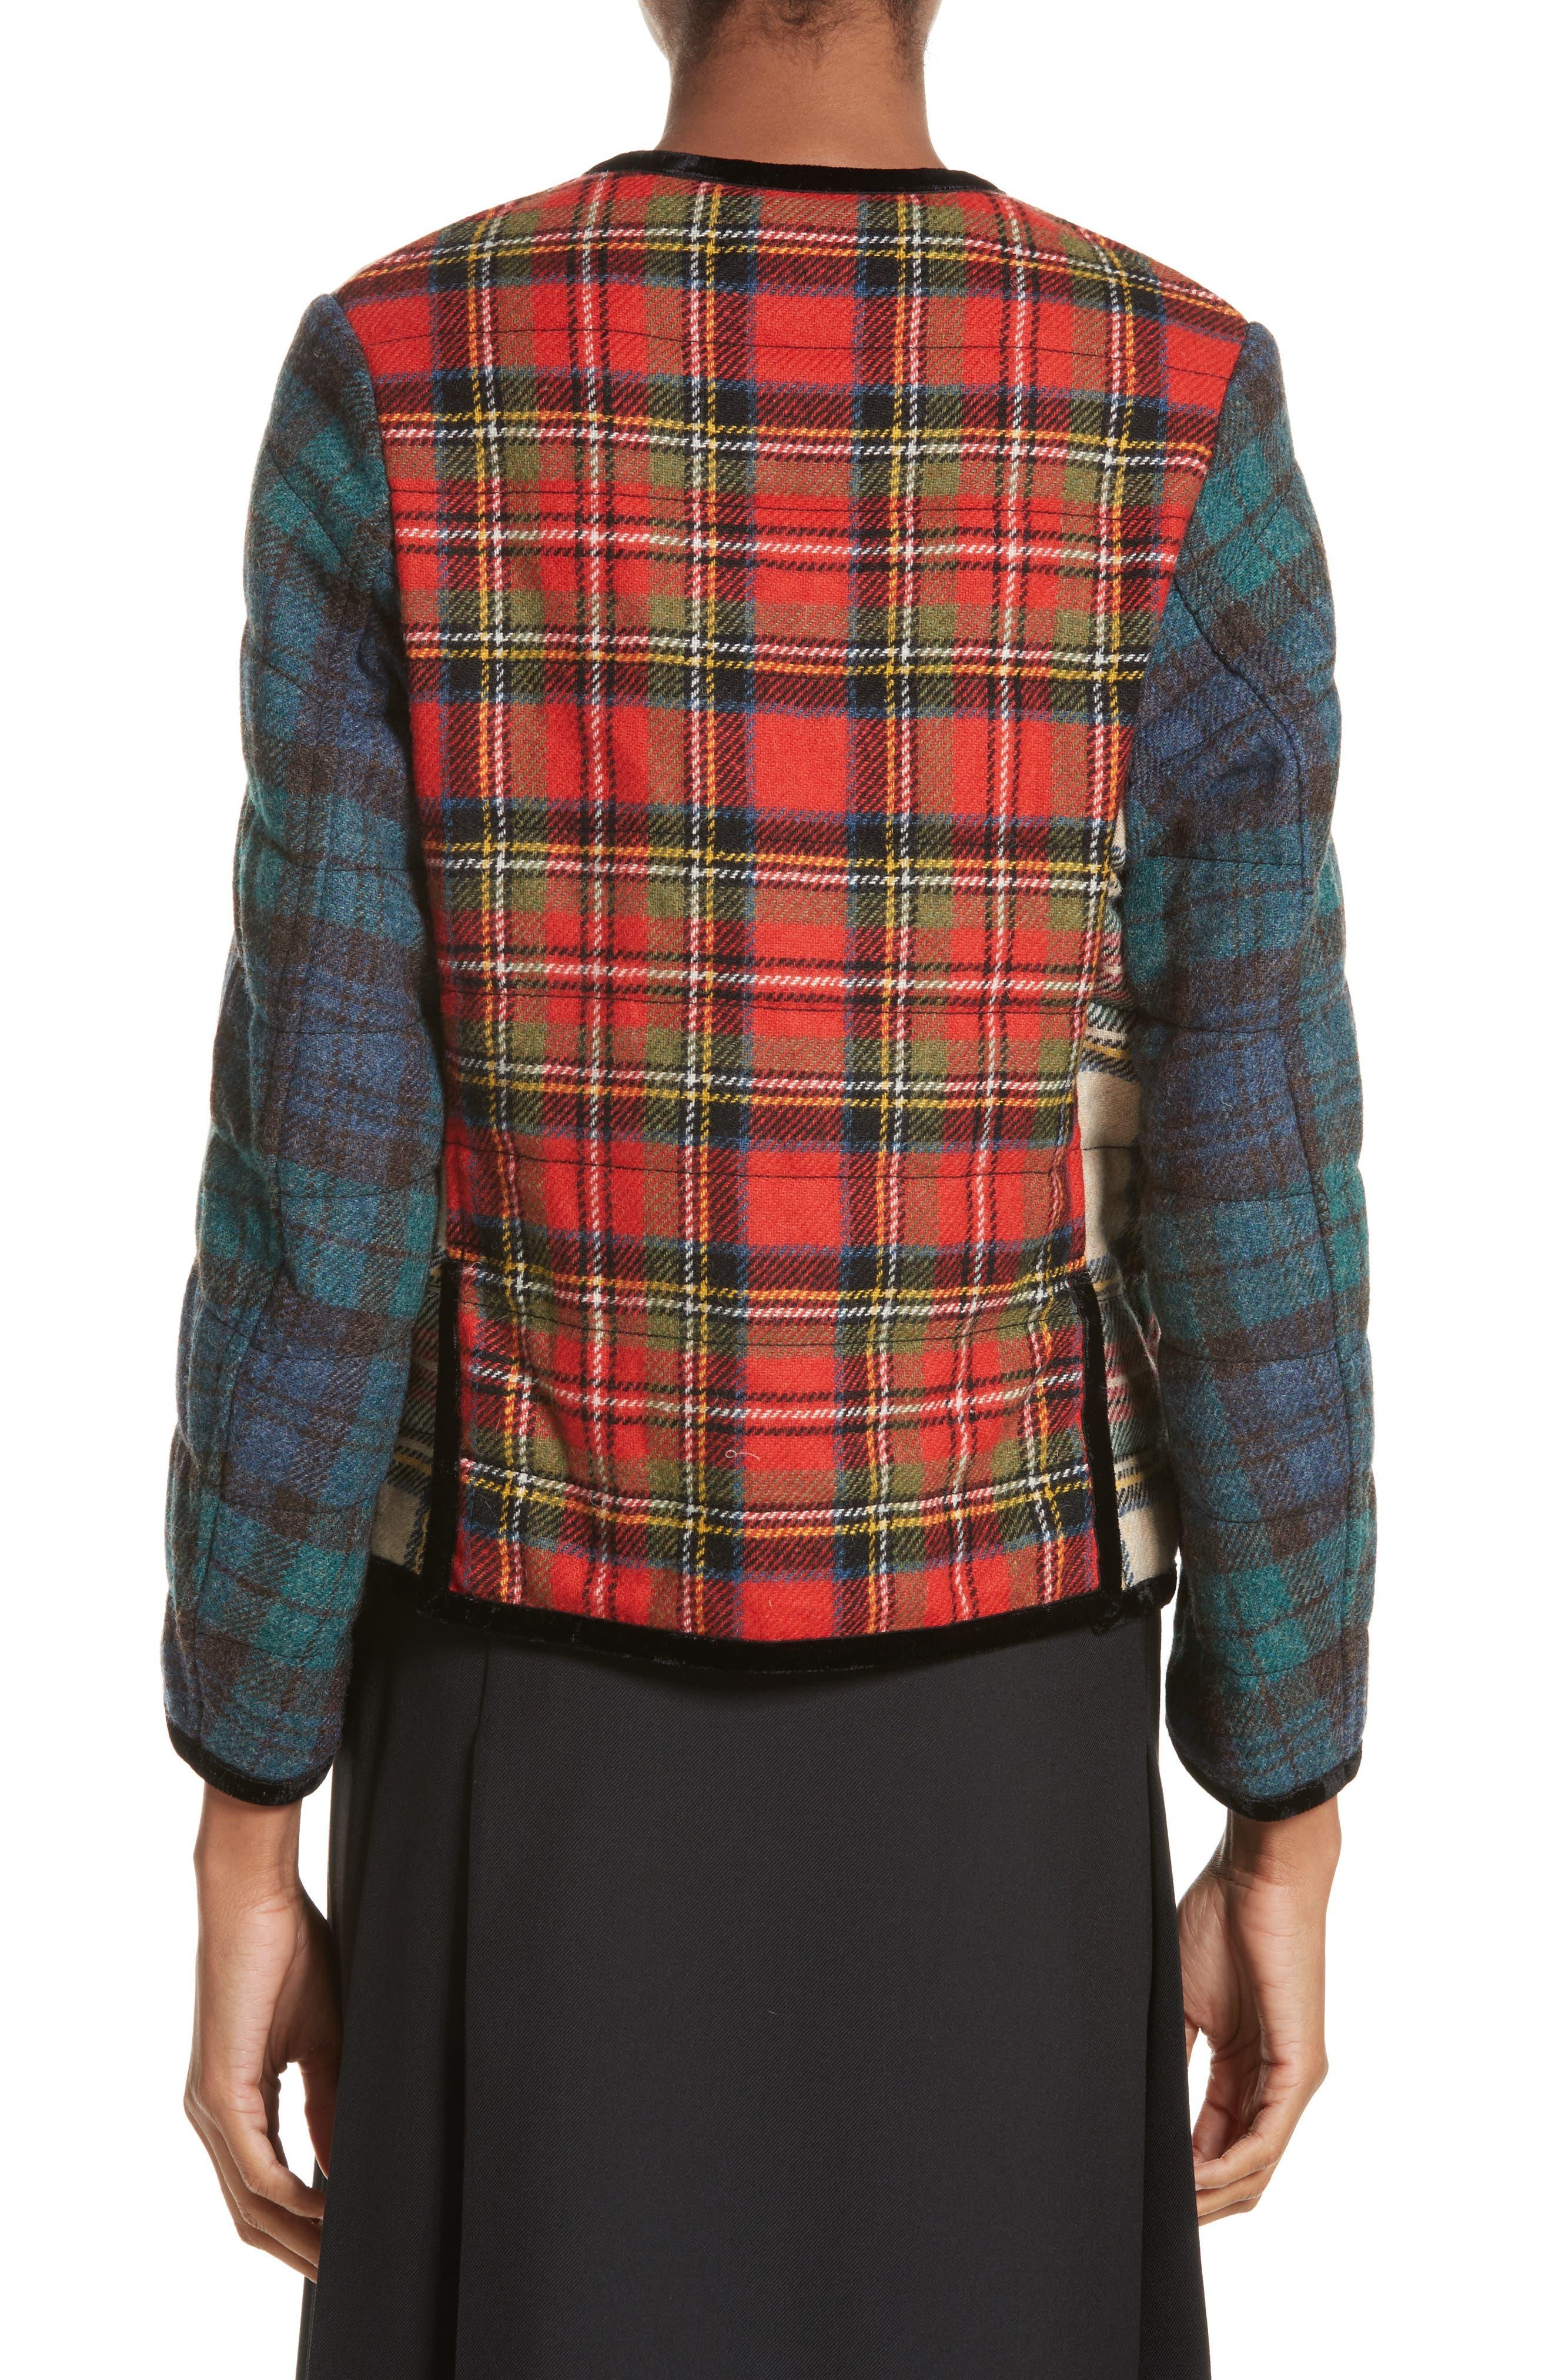 Mixed Tartan Wool Jacket,                             Alternate thumbnail 2, color,                             960